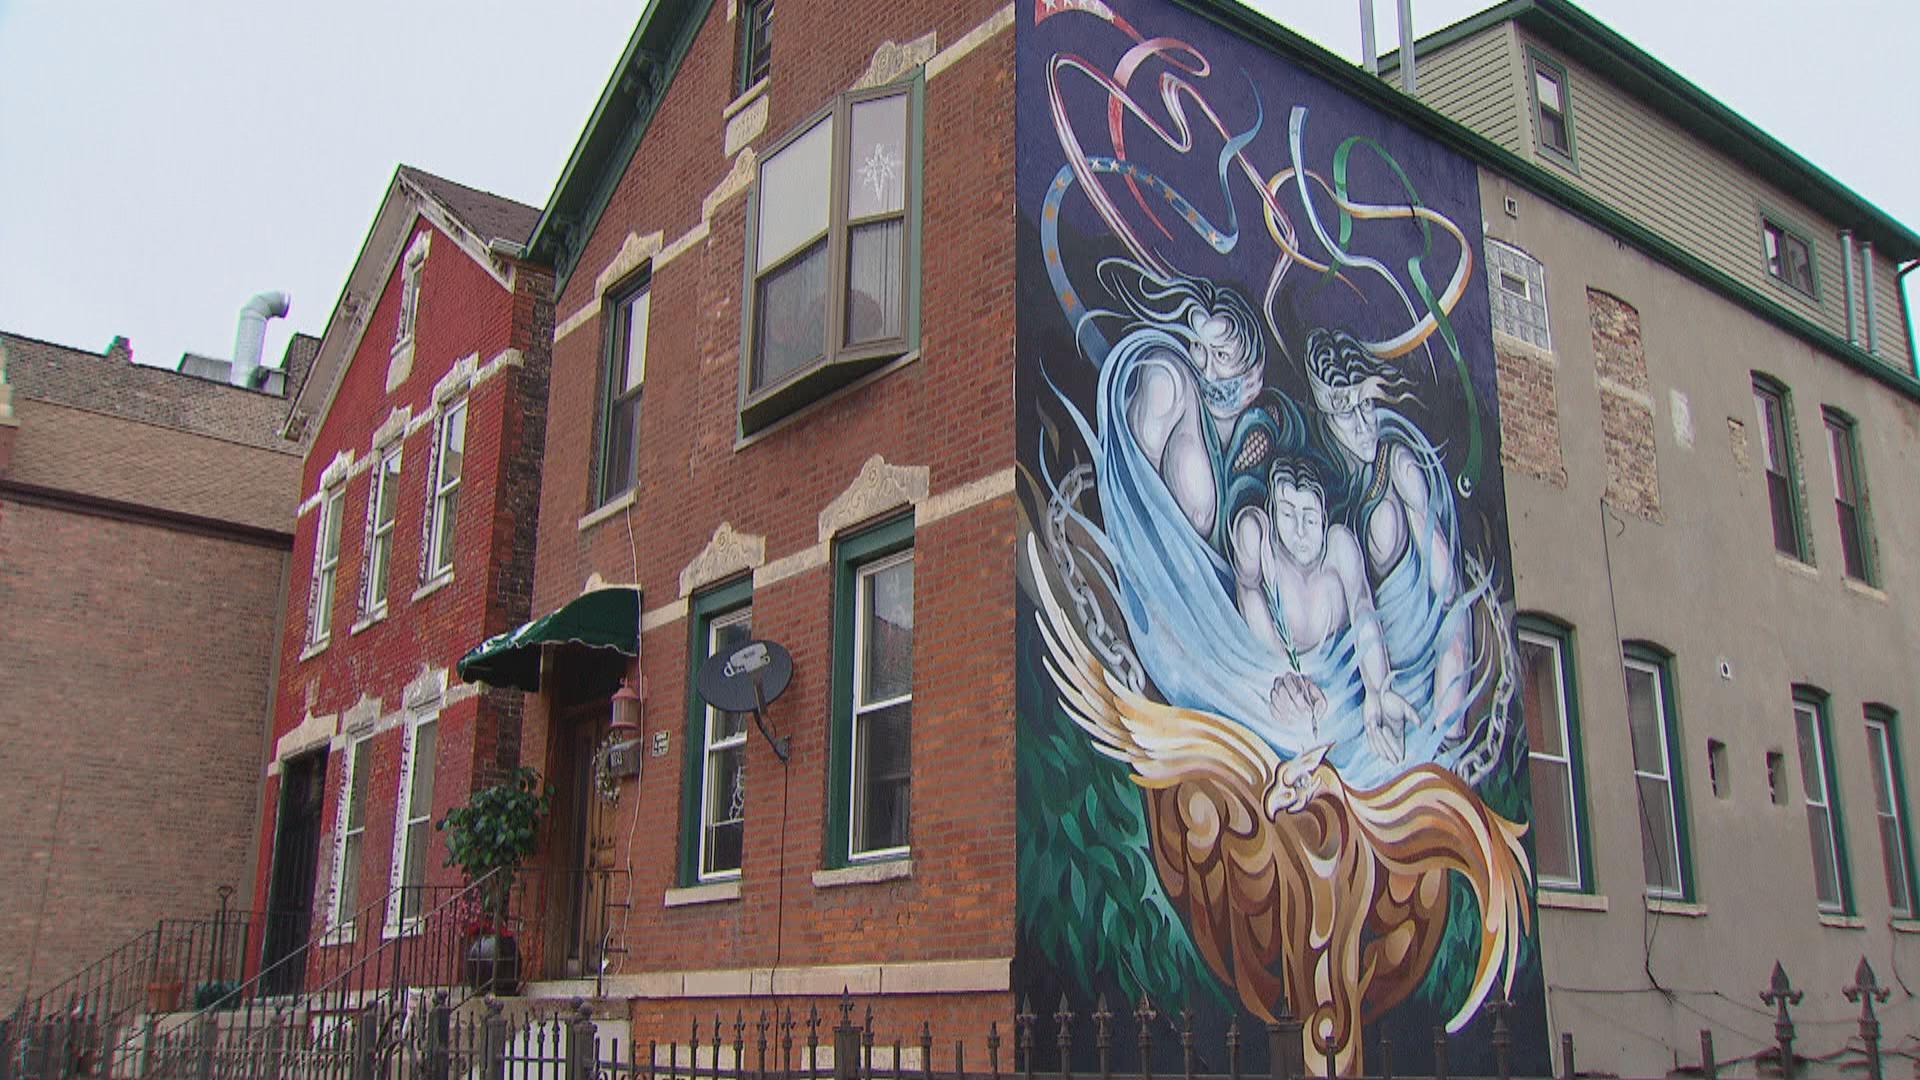 Growing Up In Bad Neighborhood Does >> Landmark Status In Pilsen Good Or Bad For The Neighborhood